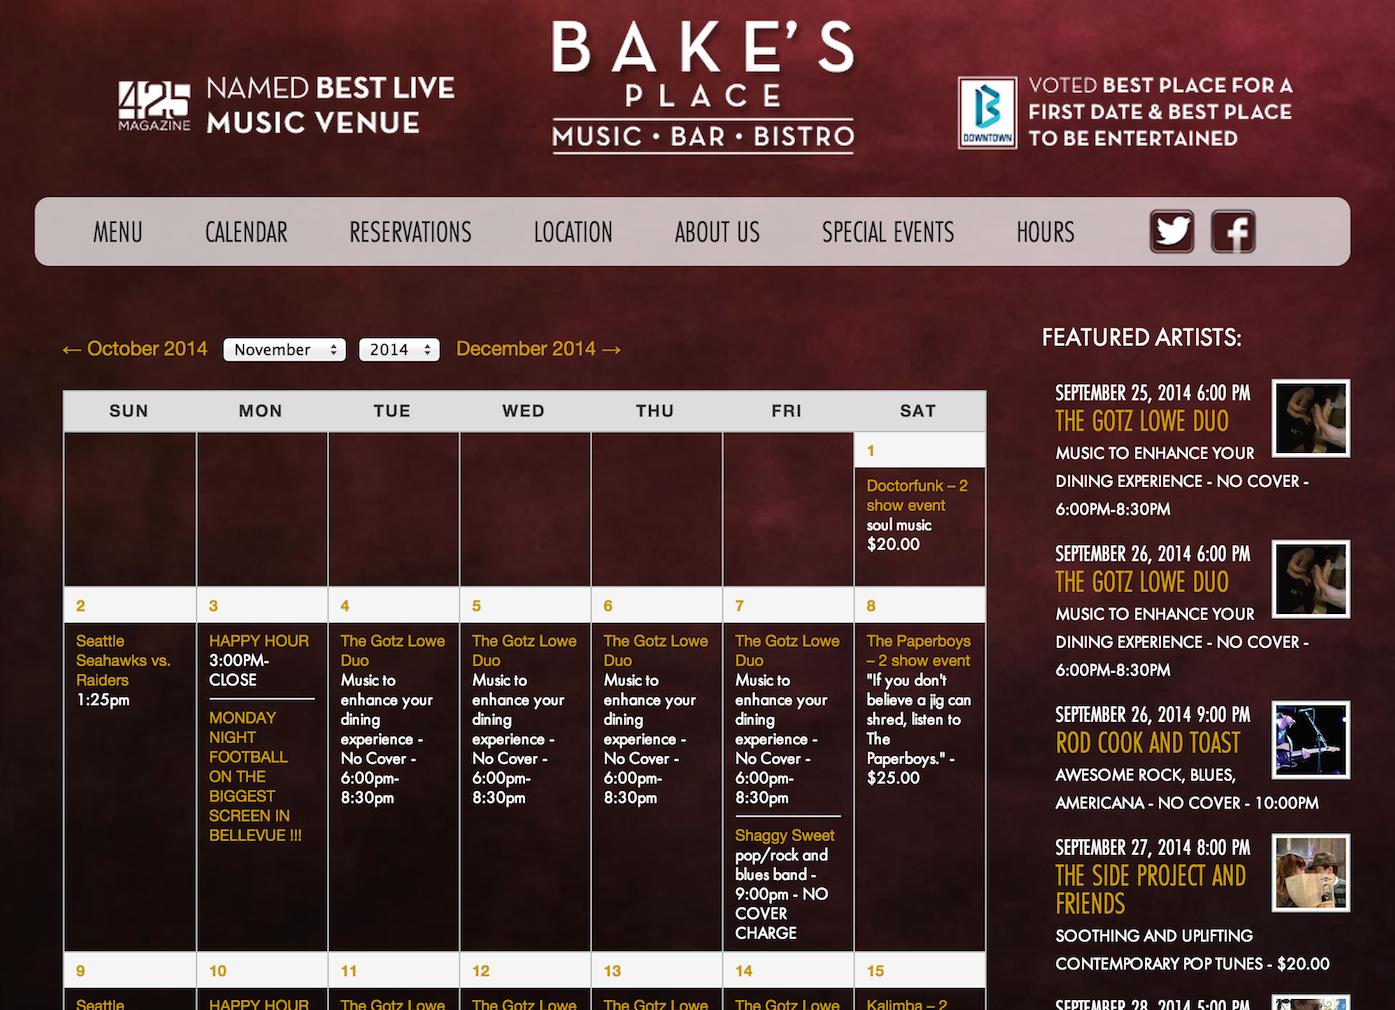 showcase - bakes place 2